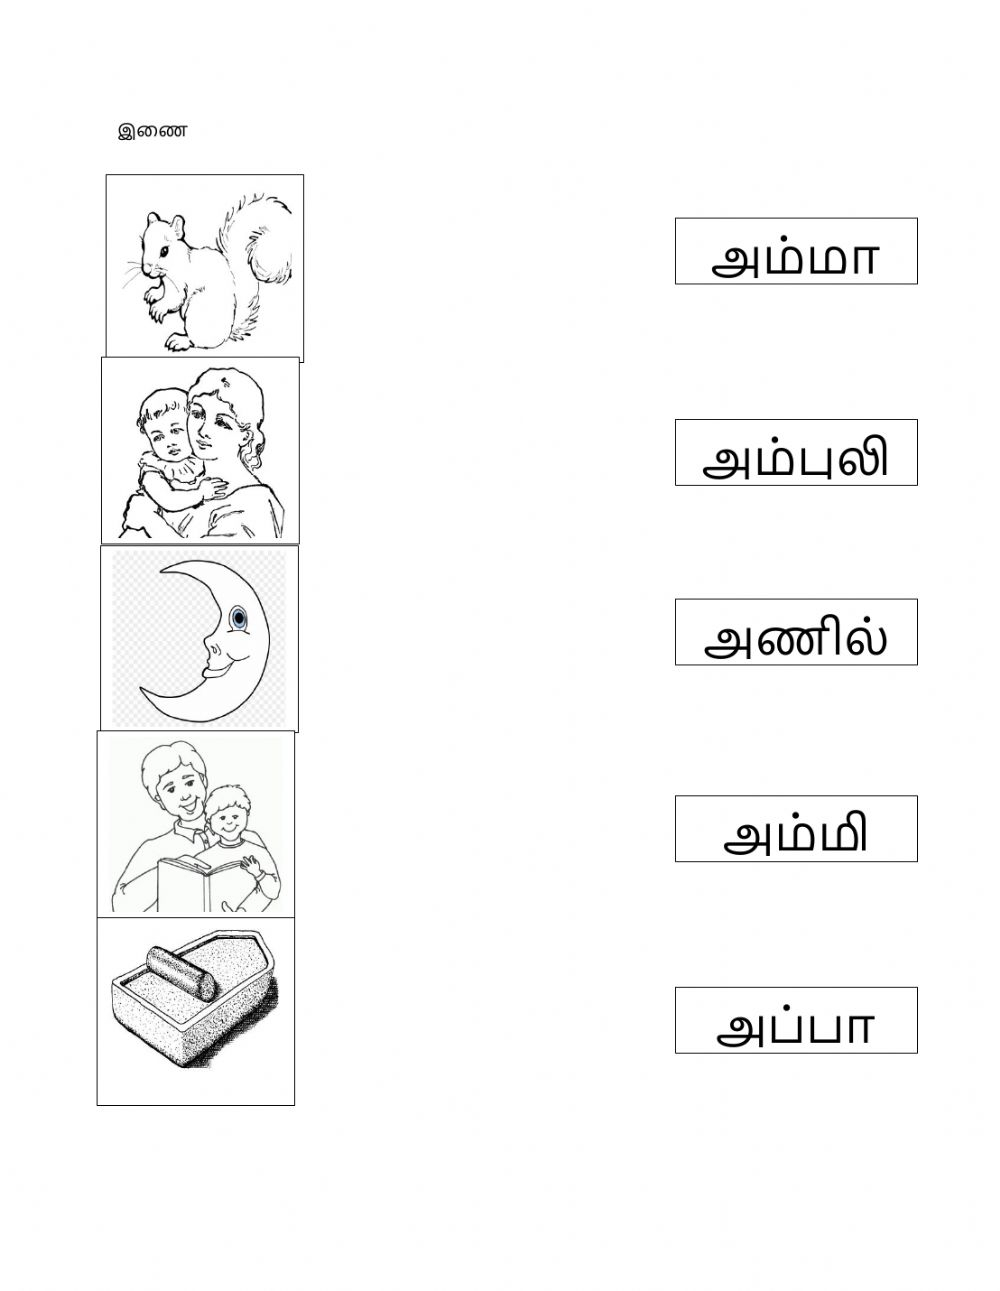 65 Marvelous Preschool Worksheets In Tamil – Lbwomen